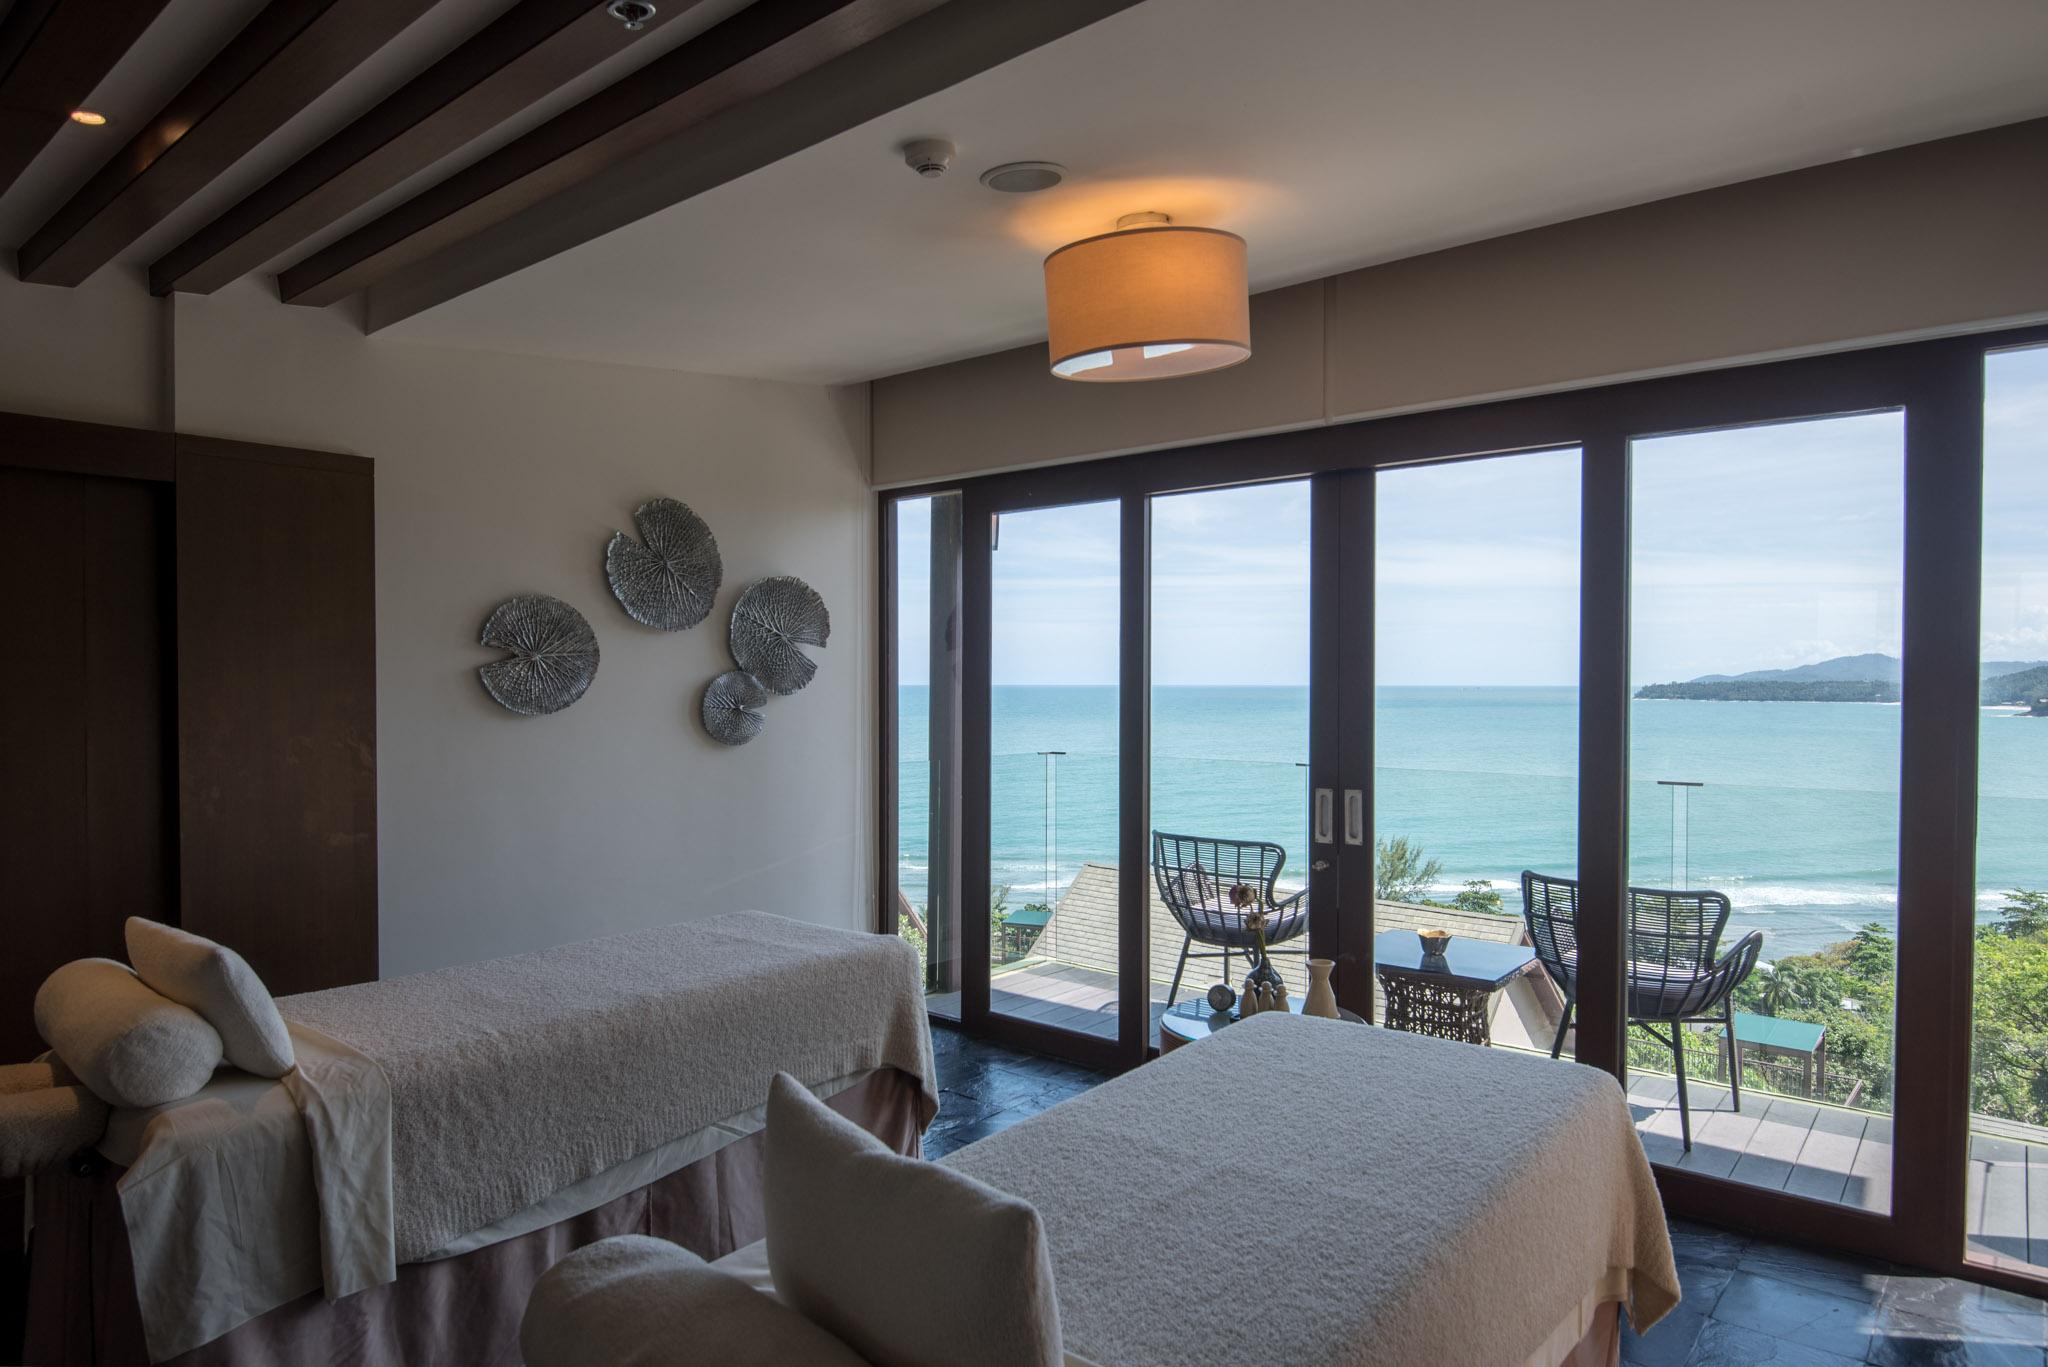 Nahm Spa The Pool Bar - Hyatt Regency Phuket Resort